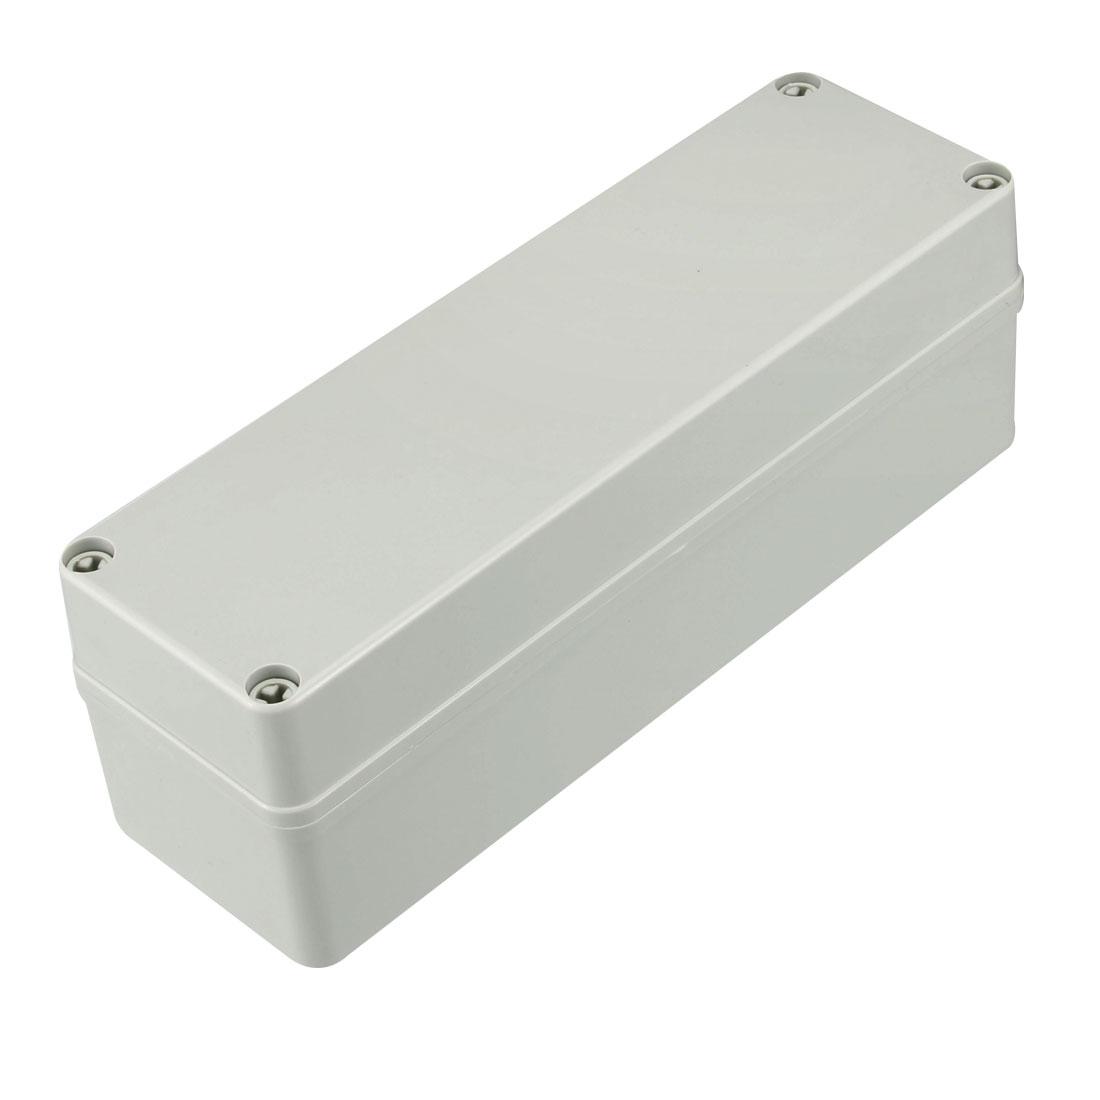 250 x 80 x 85mm Electronic Plastic DIY Junction Box Enclosure Case Gray